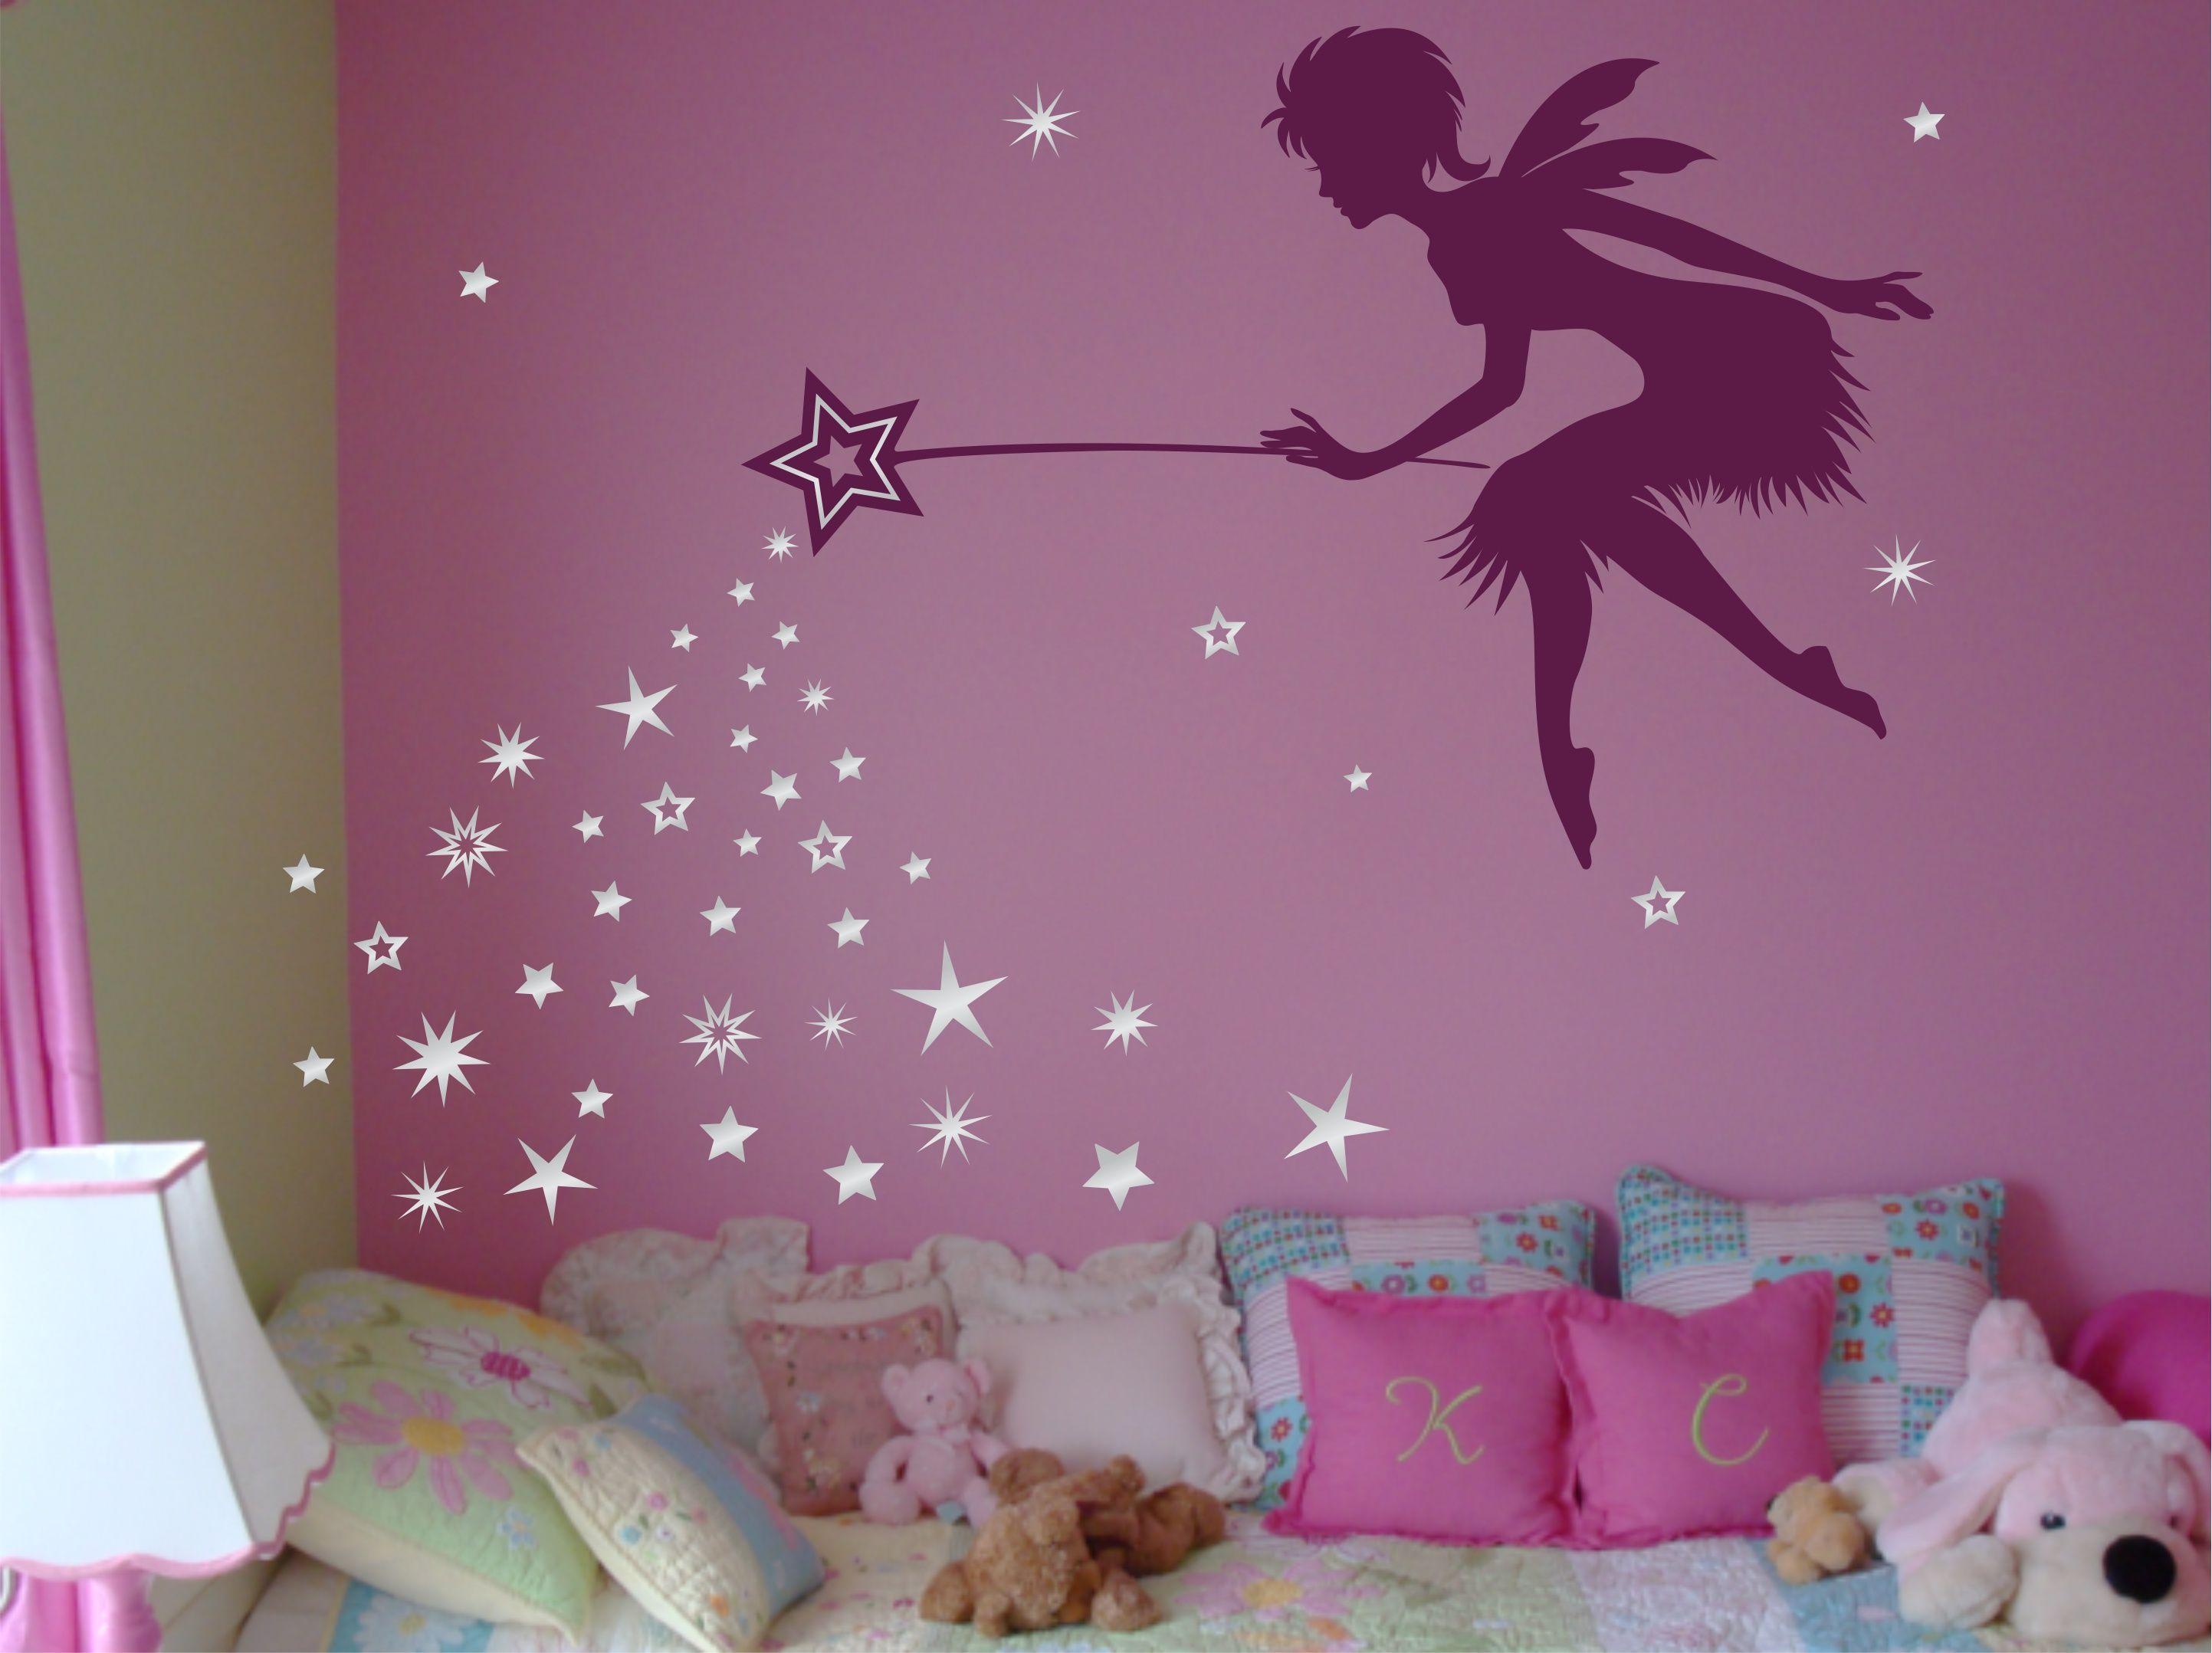 Tinkerbell Kinderzimmer ~ 18 best kids & nursery wall decals images on pinterest kids